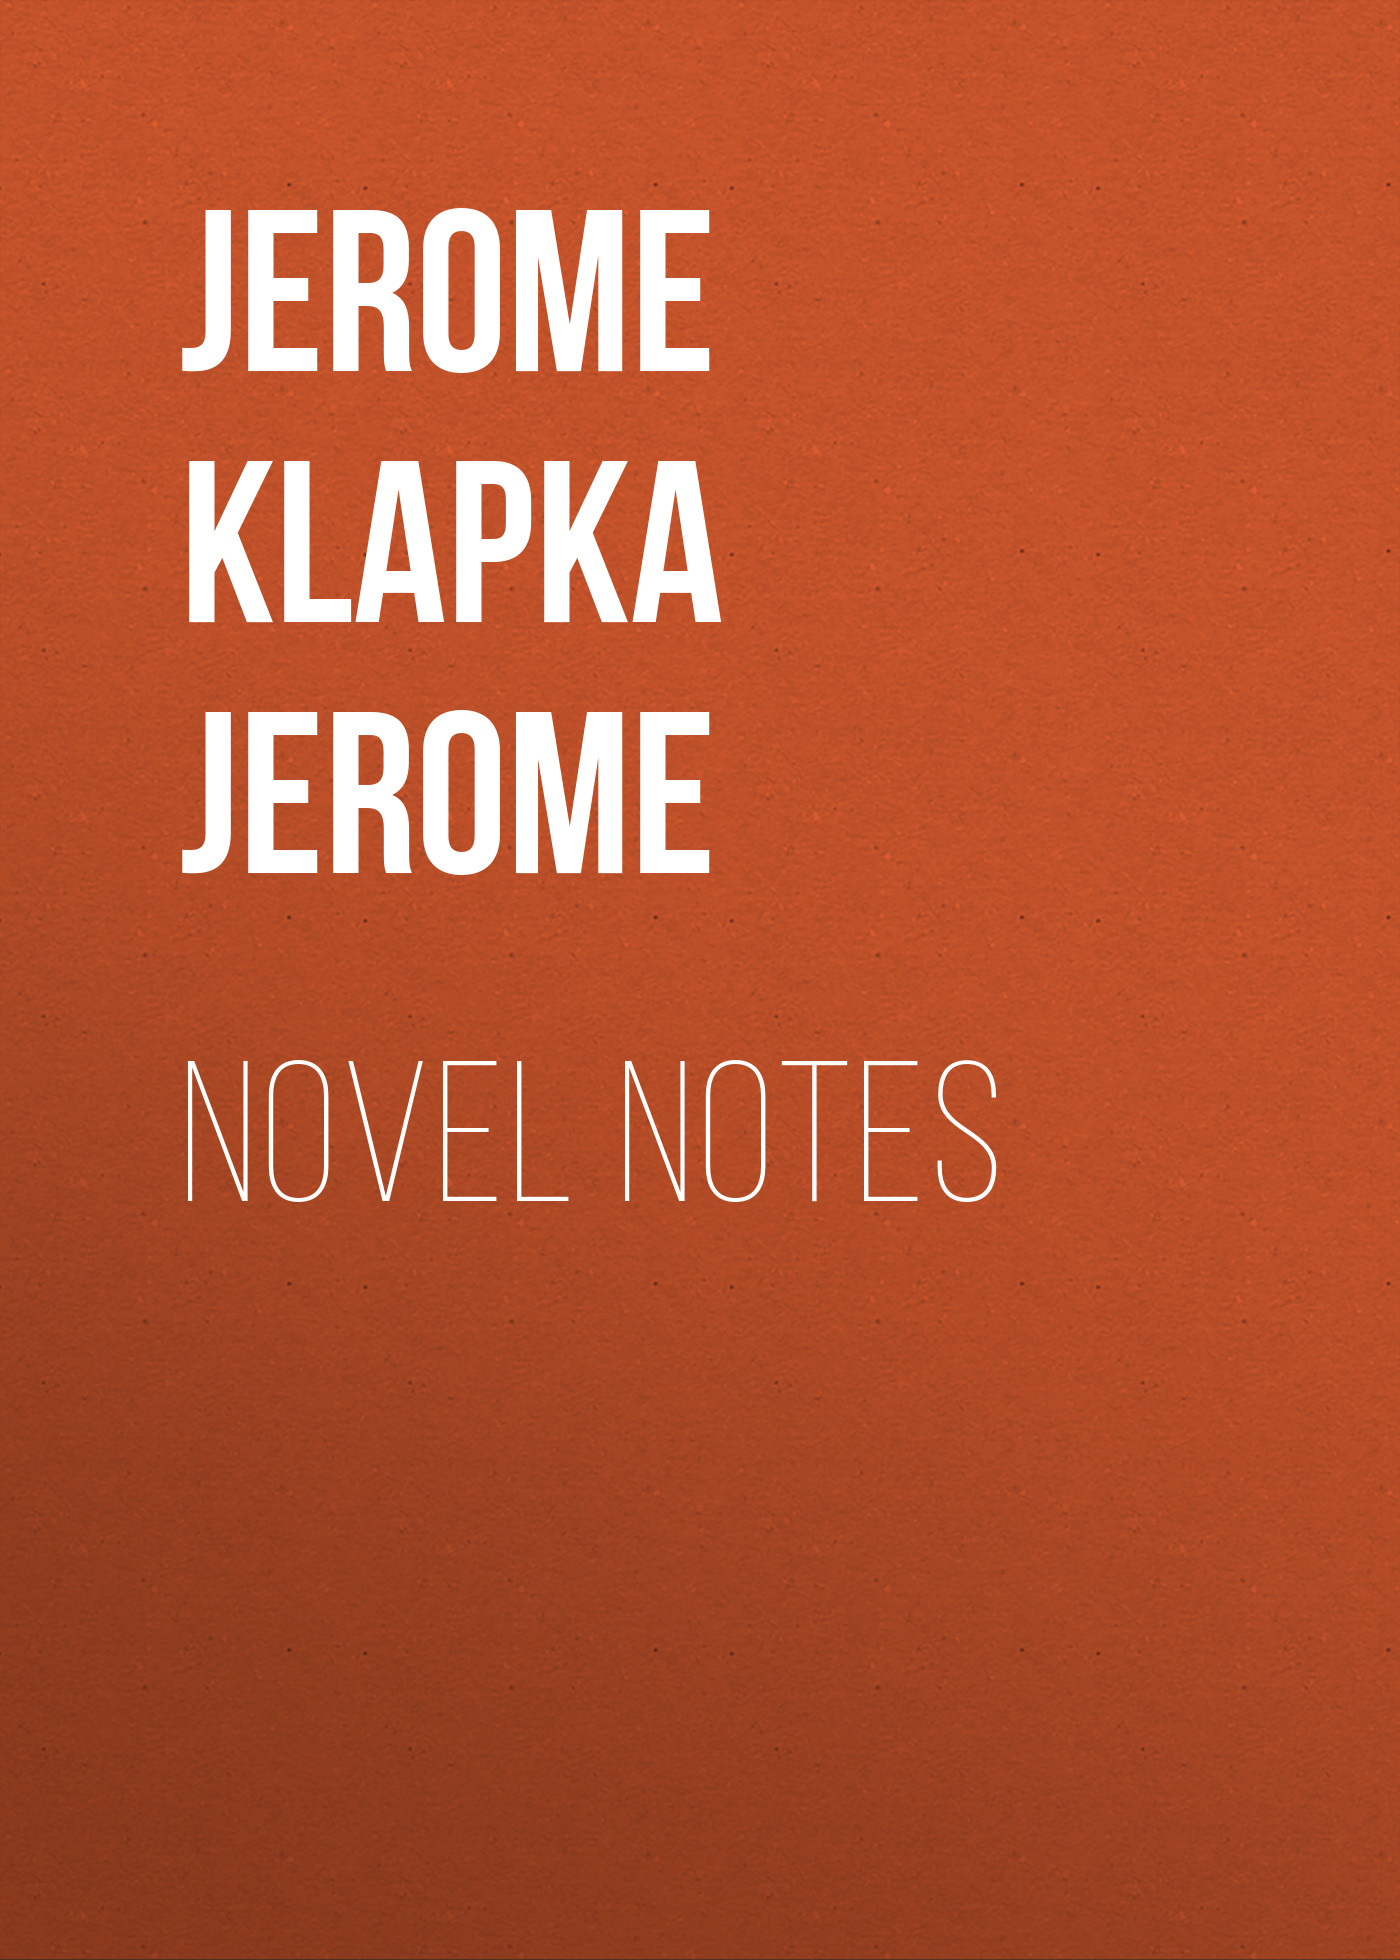 Джером Клапка Джером Novel Notes джером клапка джером evergreens